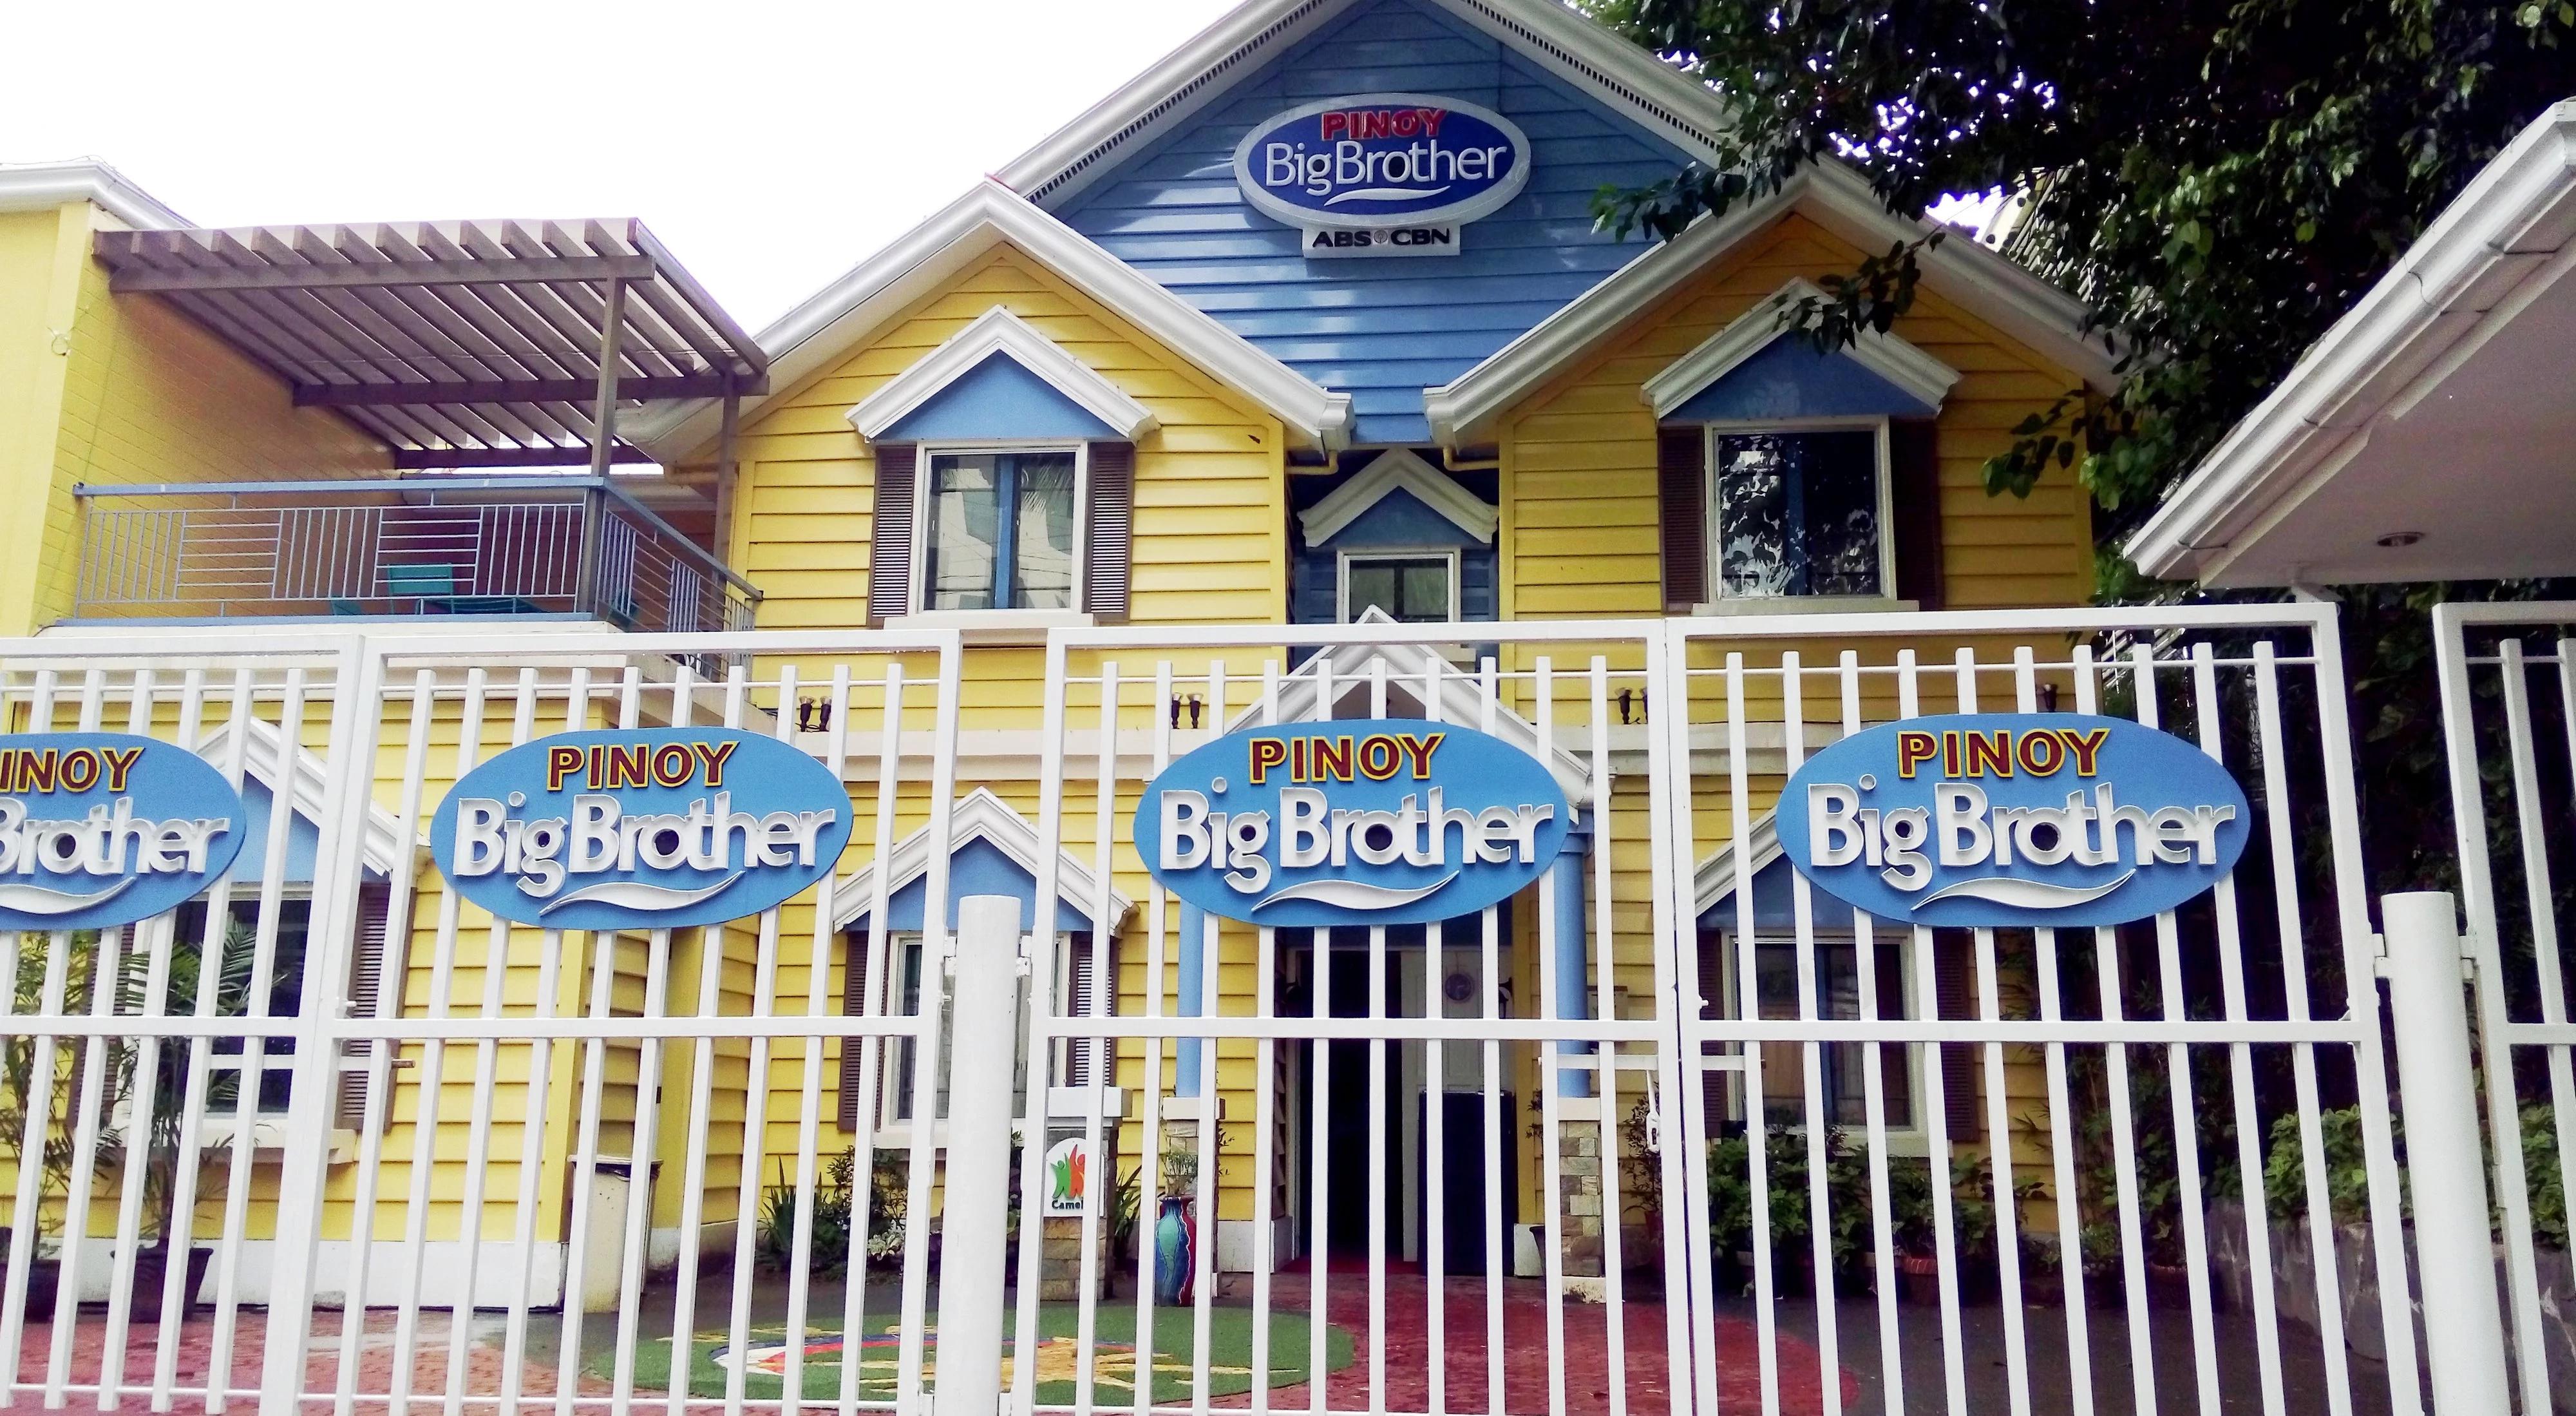 PBB Lucky season 7's twist: Housemates housed in Vietnam